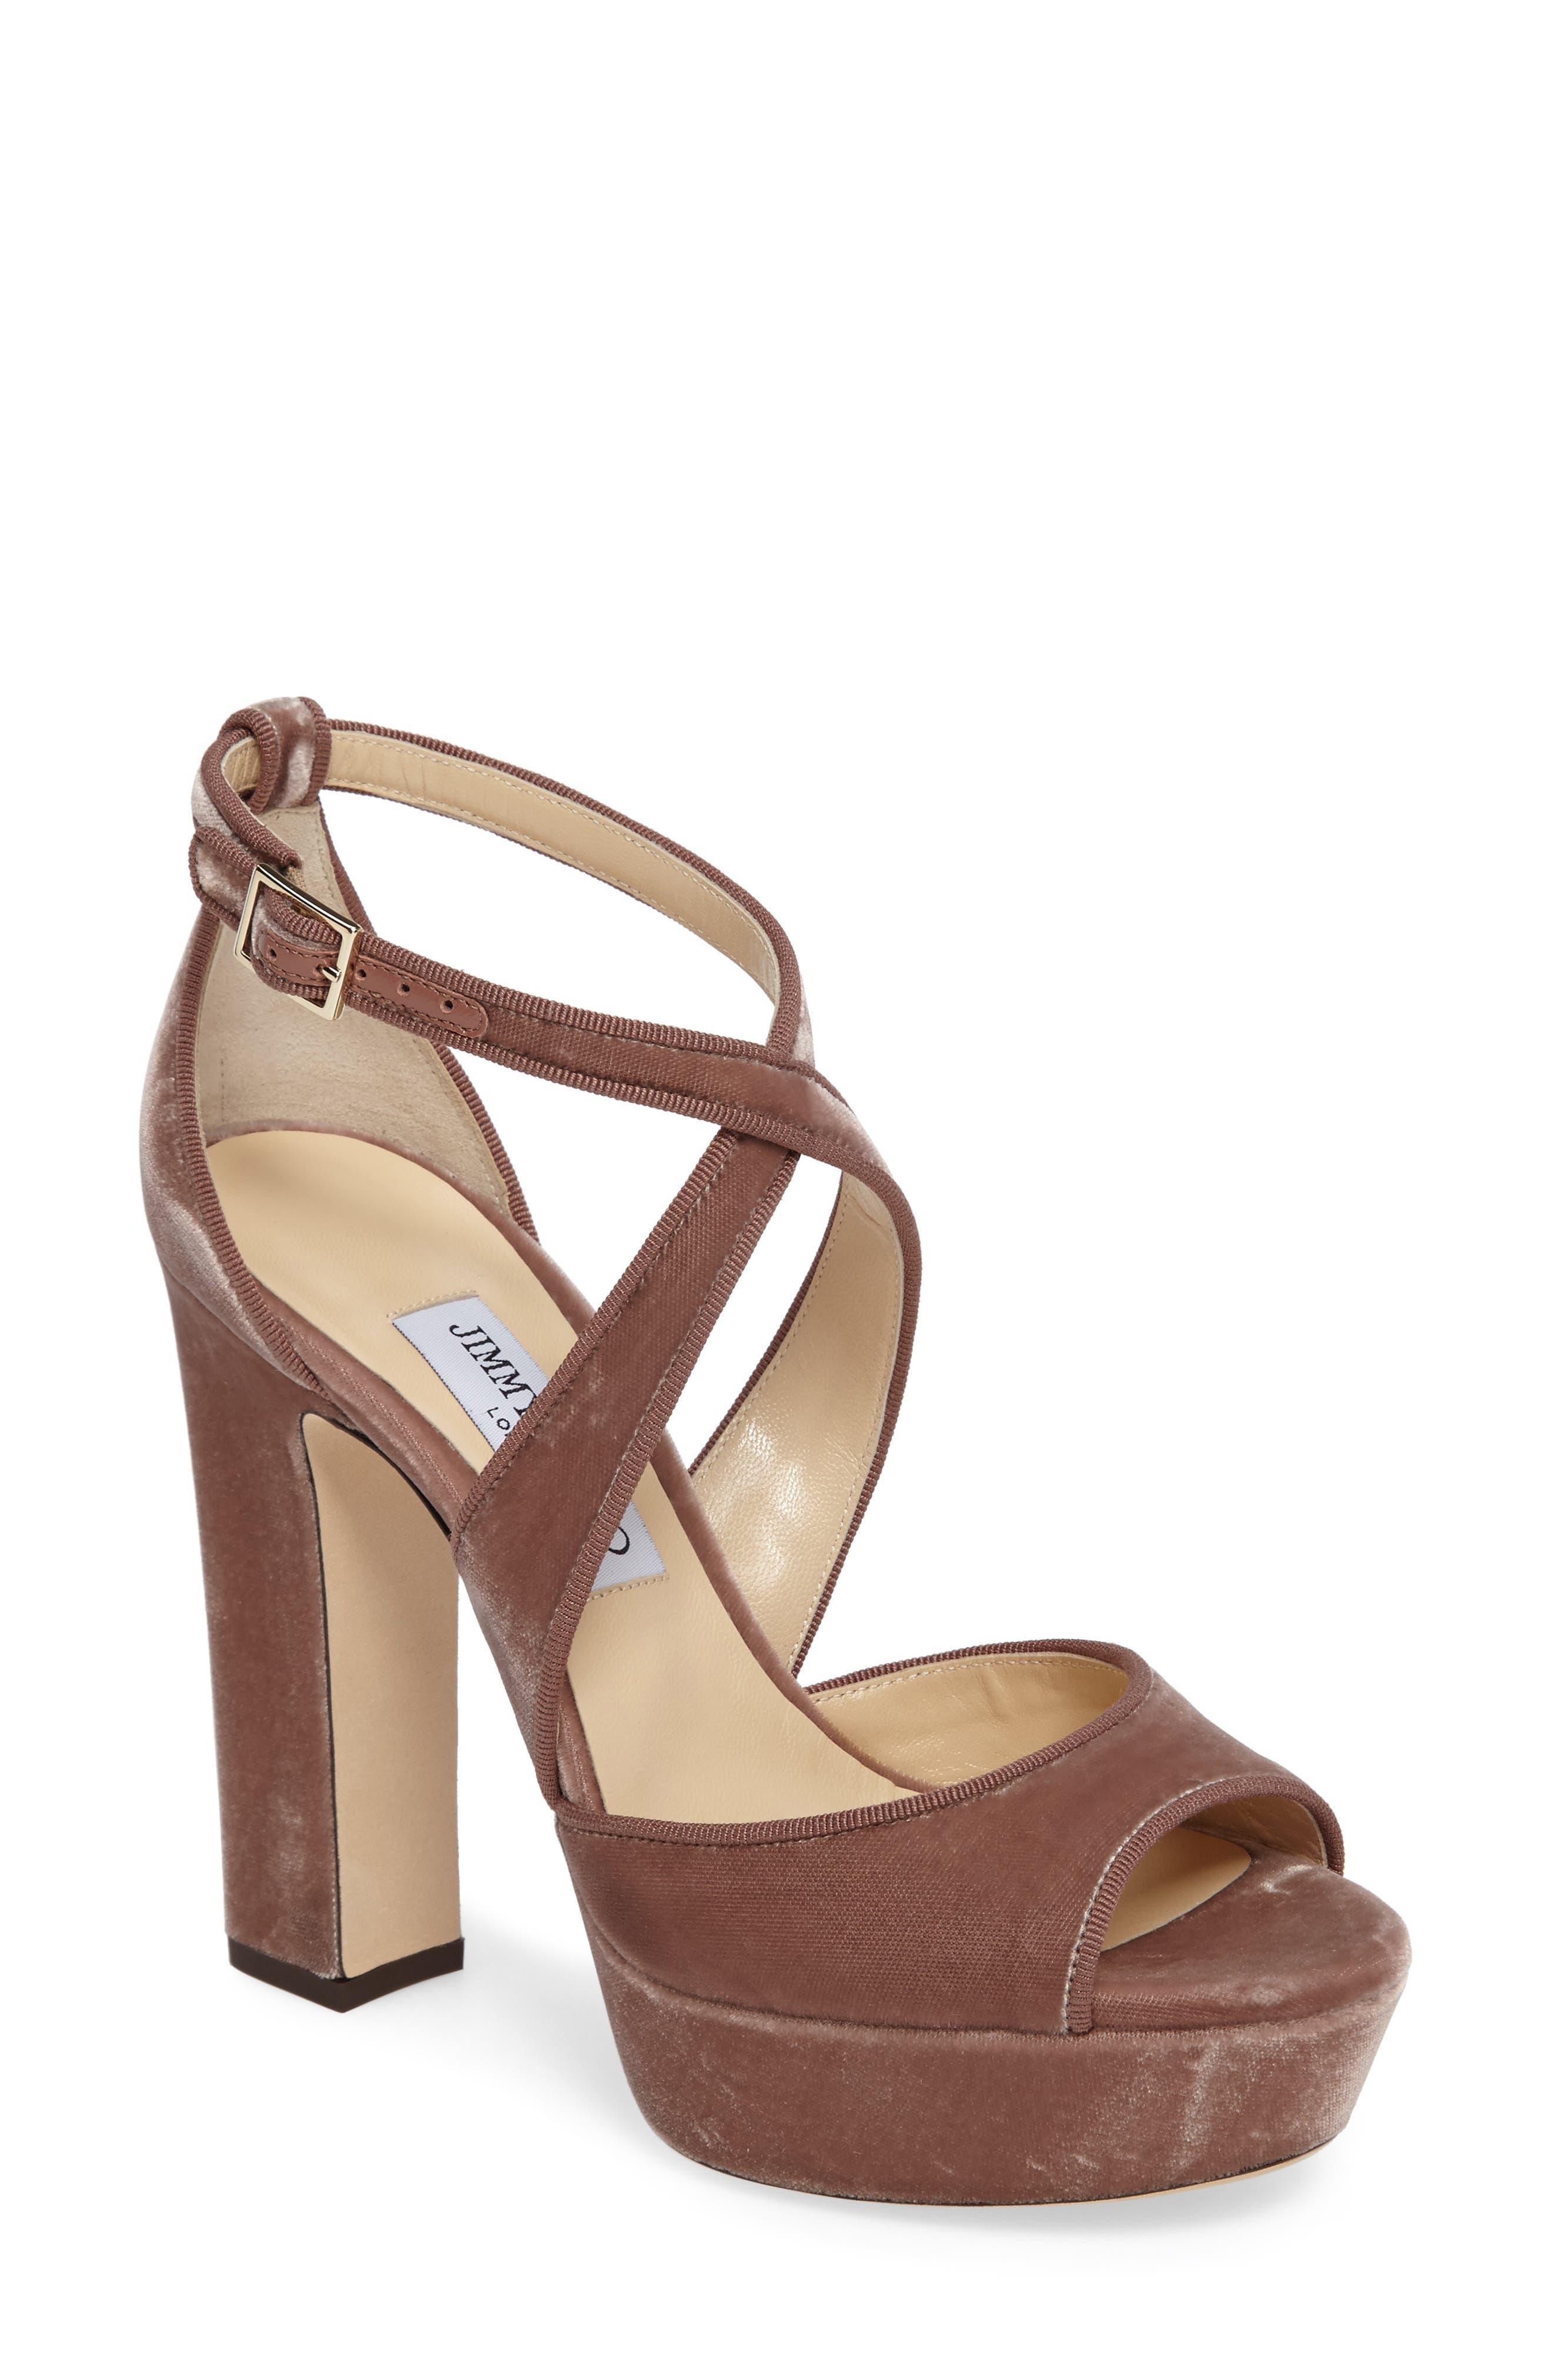 Main Image - Jimmy Choo April Platform Sandal (Women)